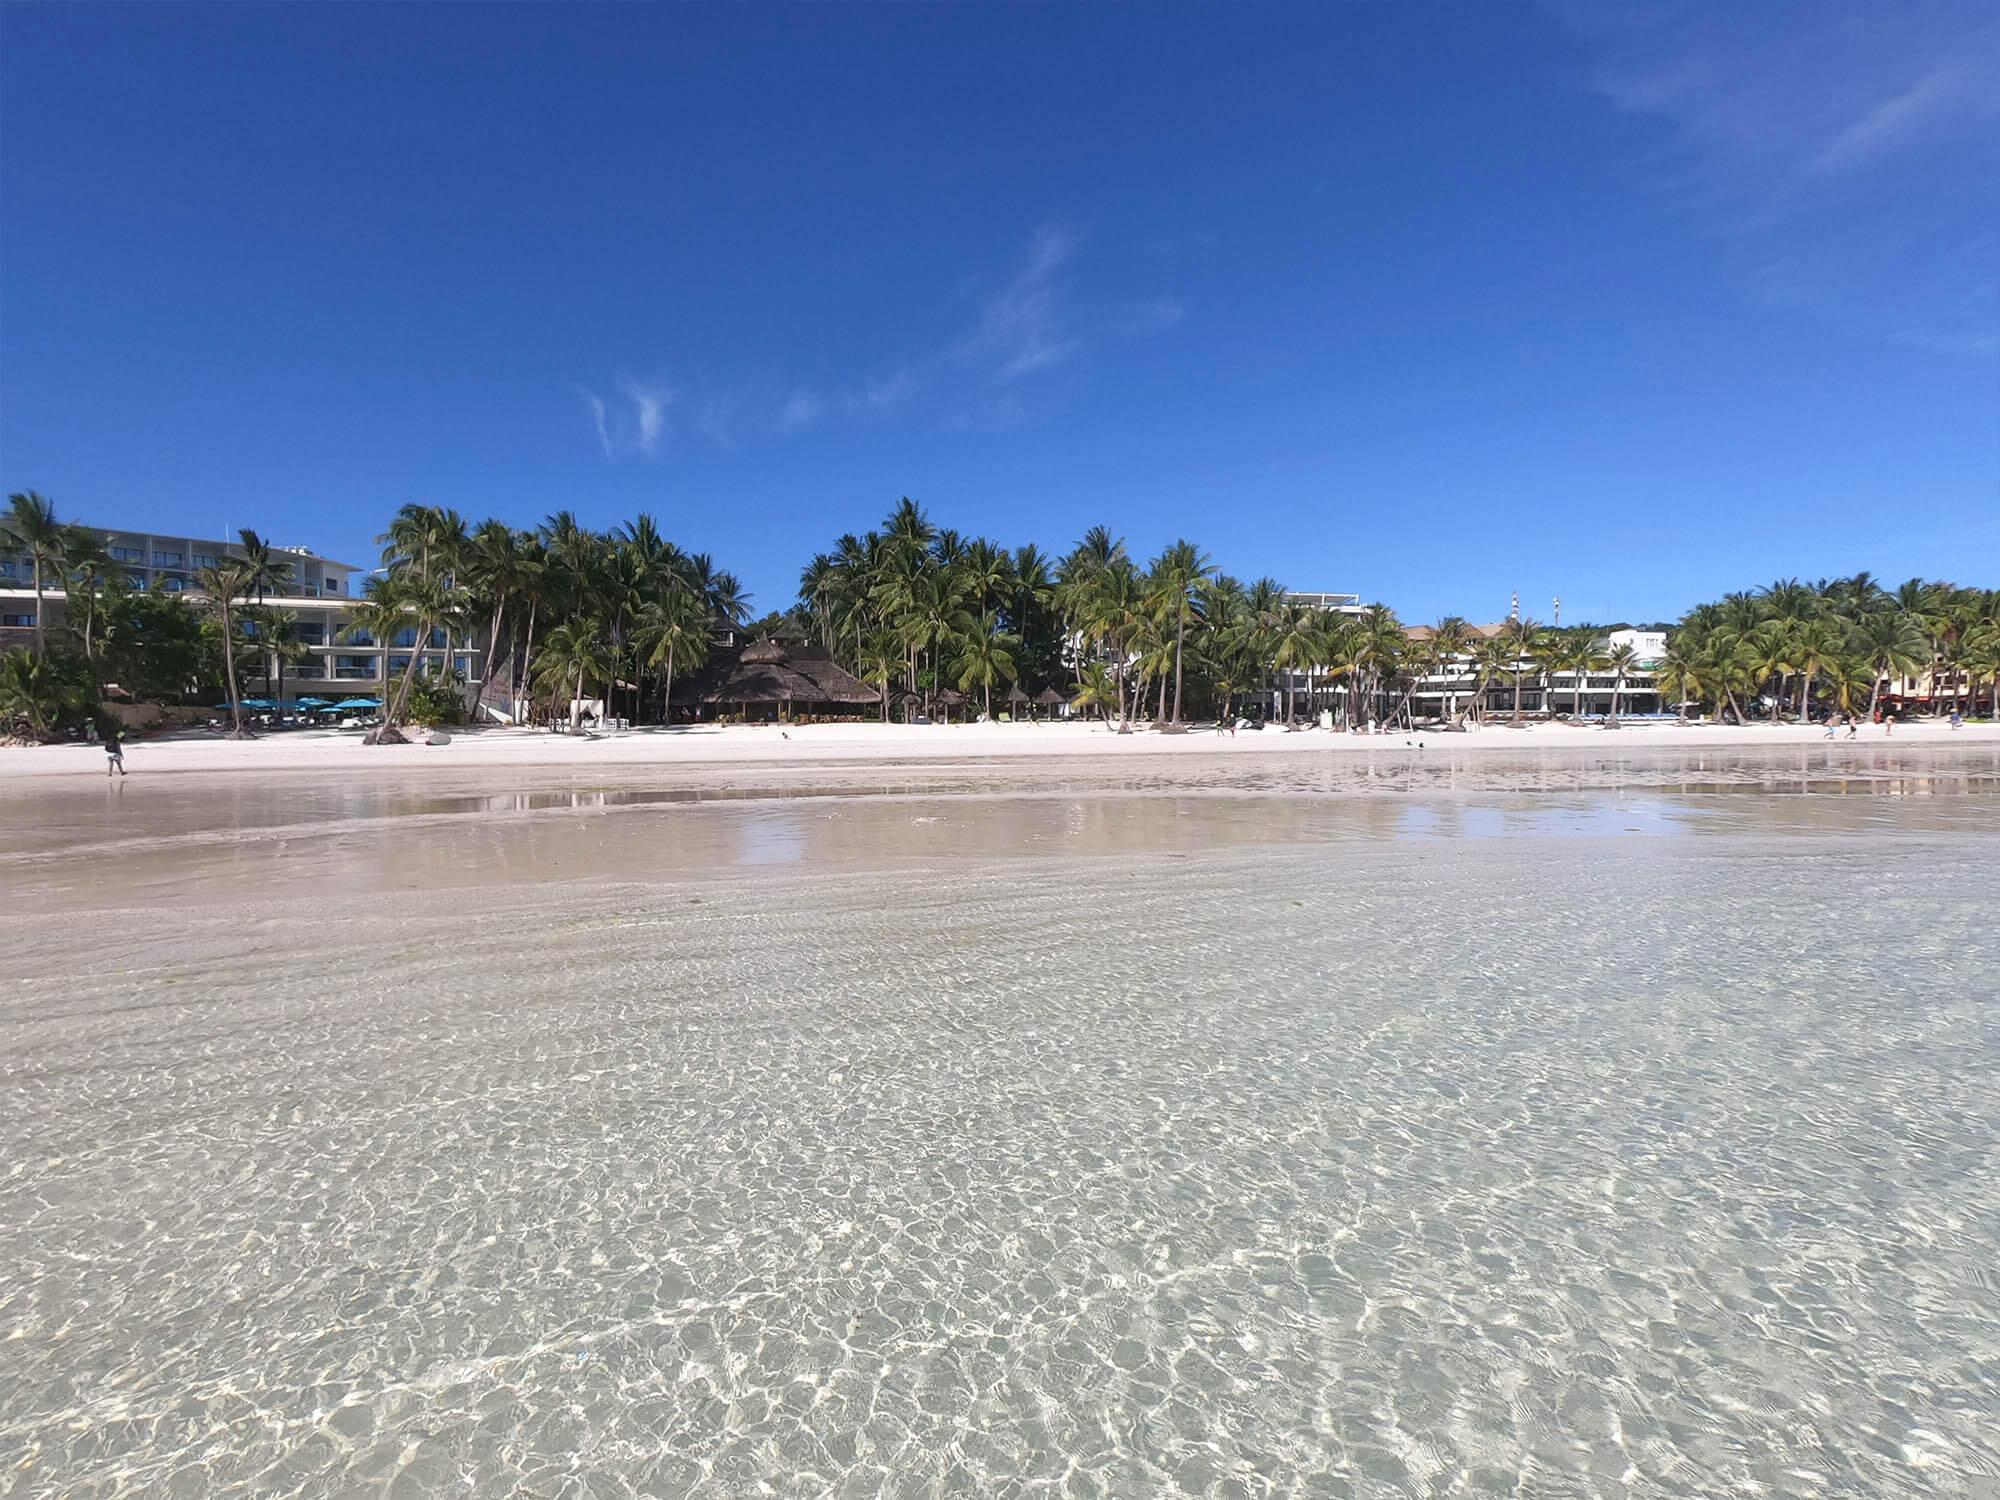 s1沙灘往岸上看